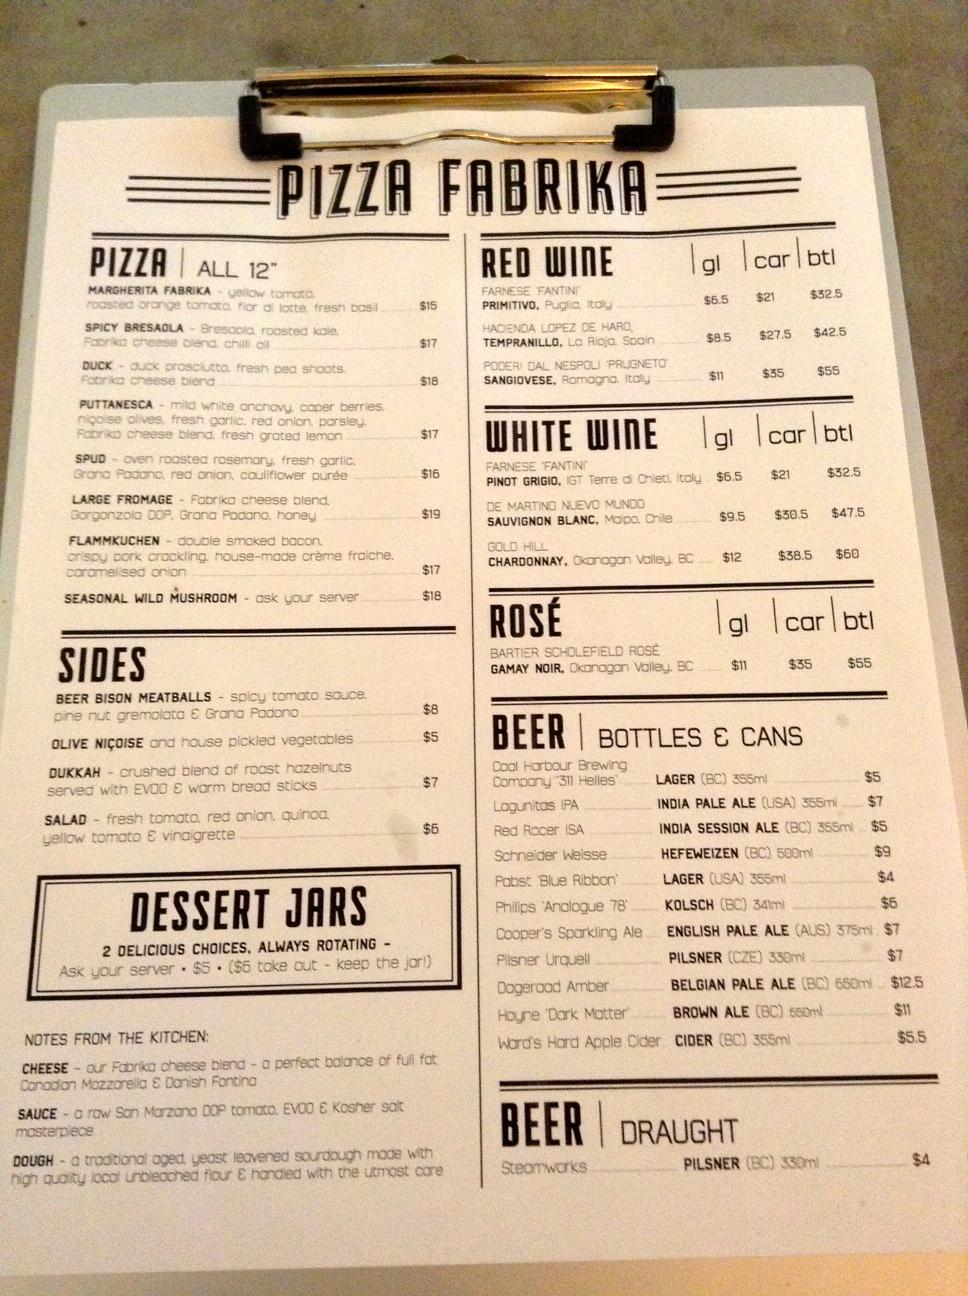 pizzafab1.jpg